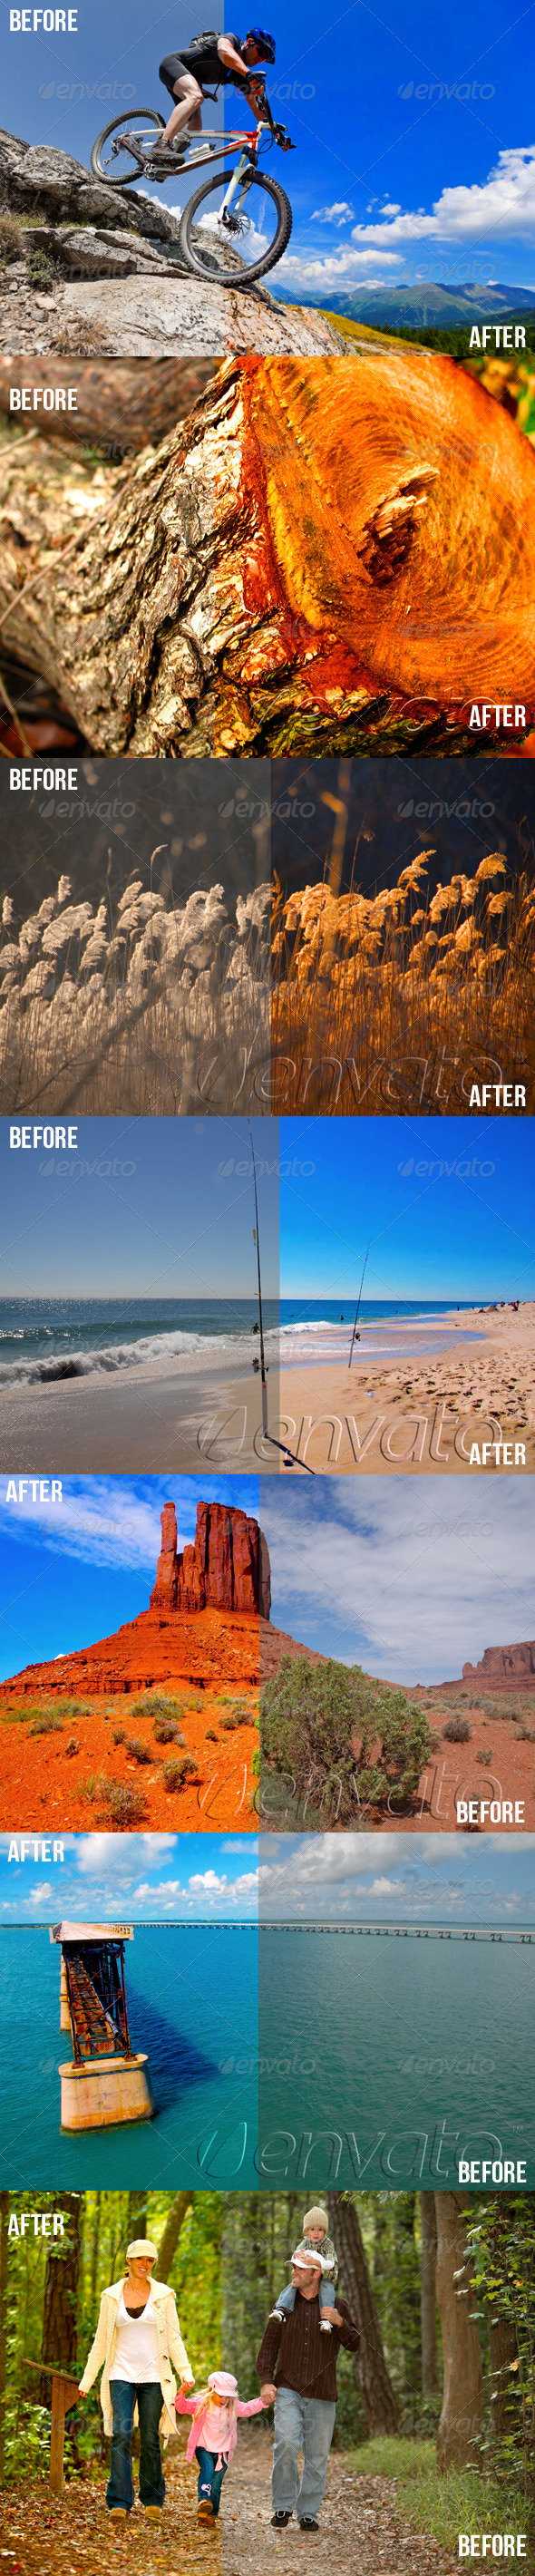 GraphicRiver Photoshop Color Enhance Actions 4753807